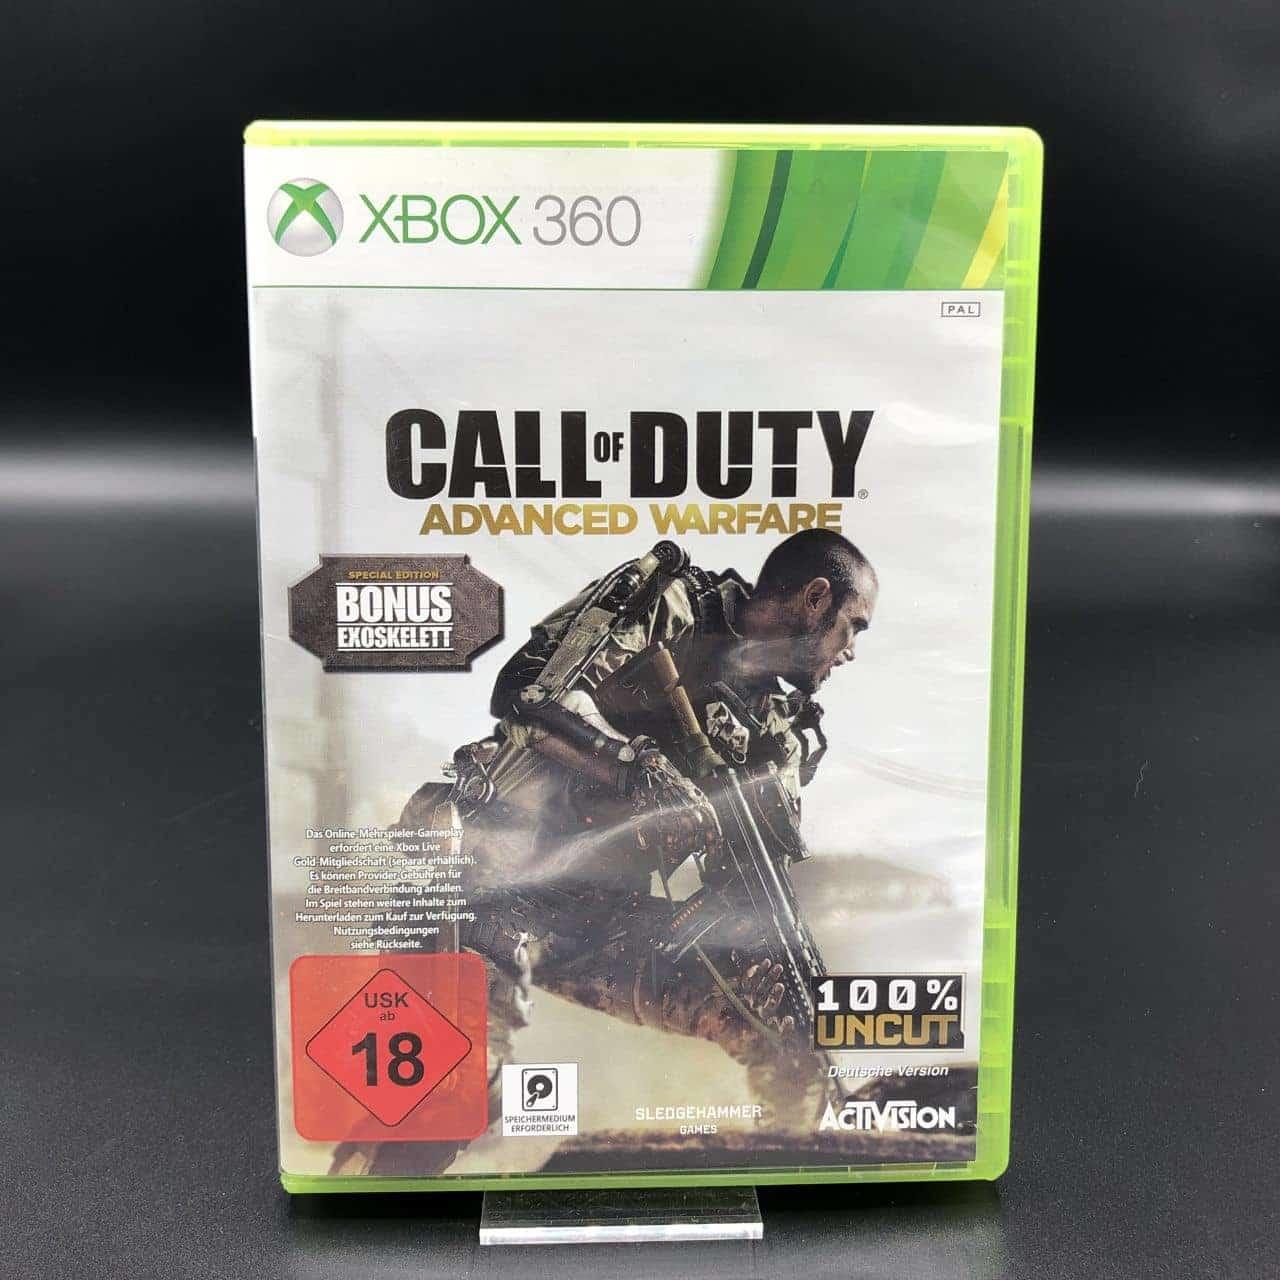 Call of Duty: Advanced Warfare (Komplett) (Sehr gut) Microsoft Xbox 360 (FSK18)